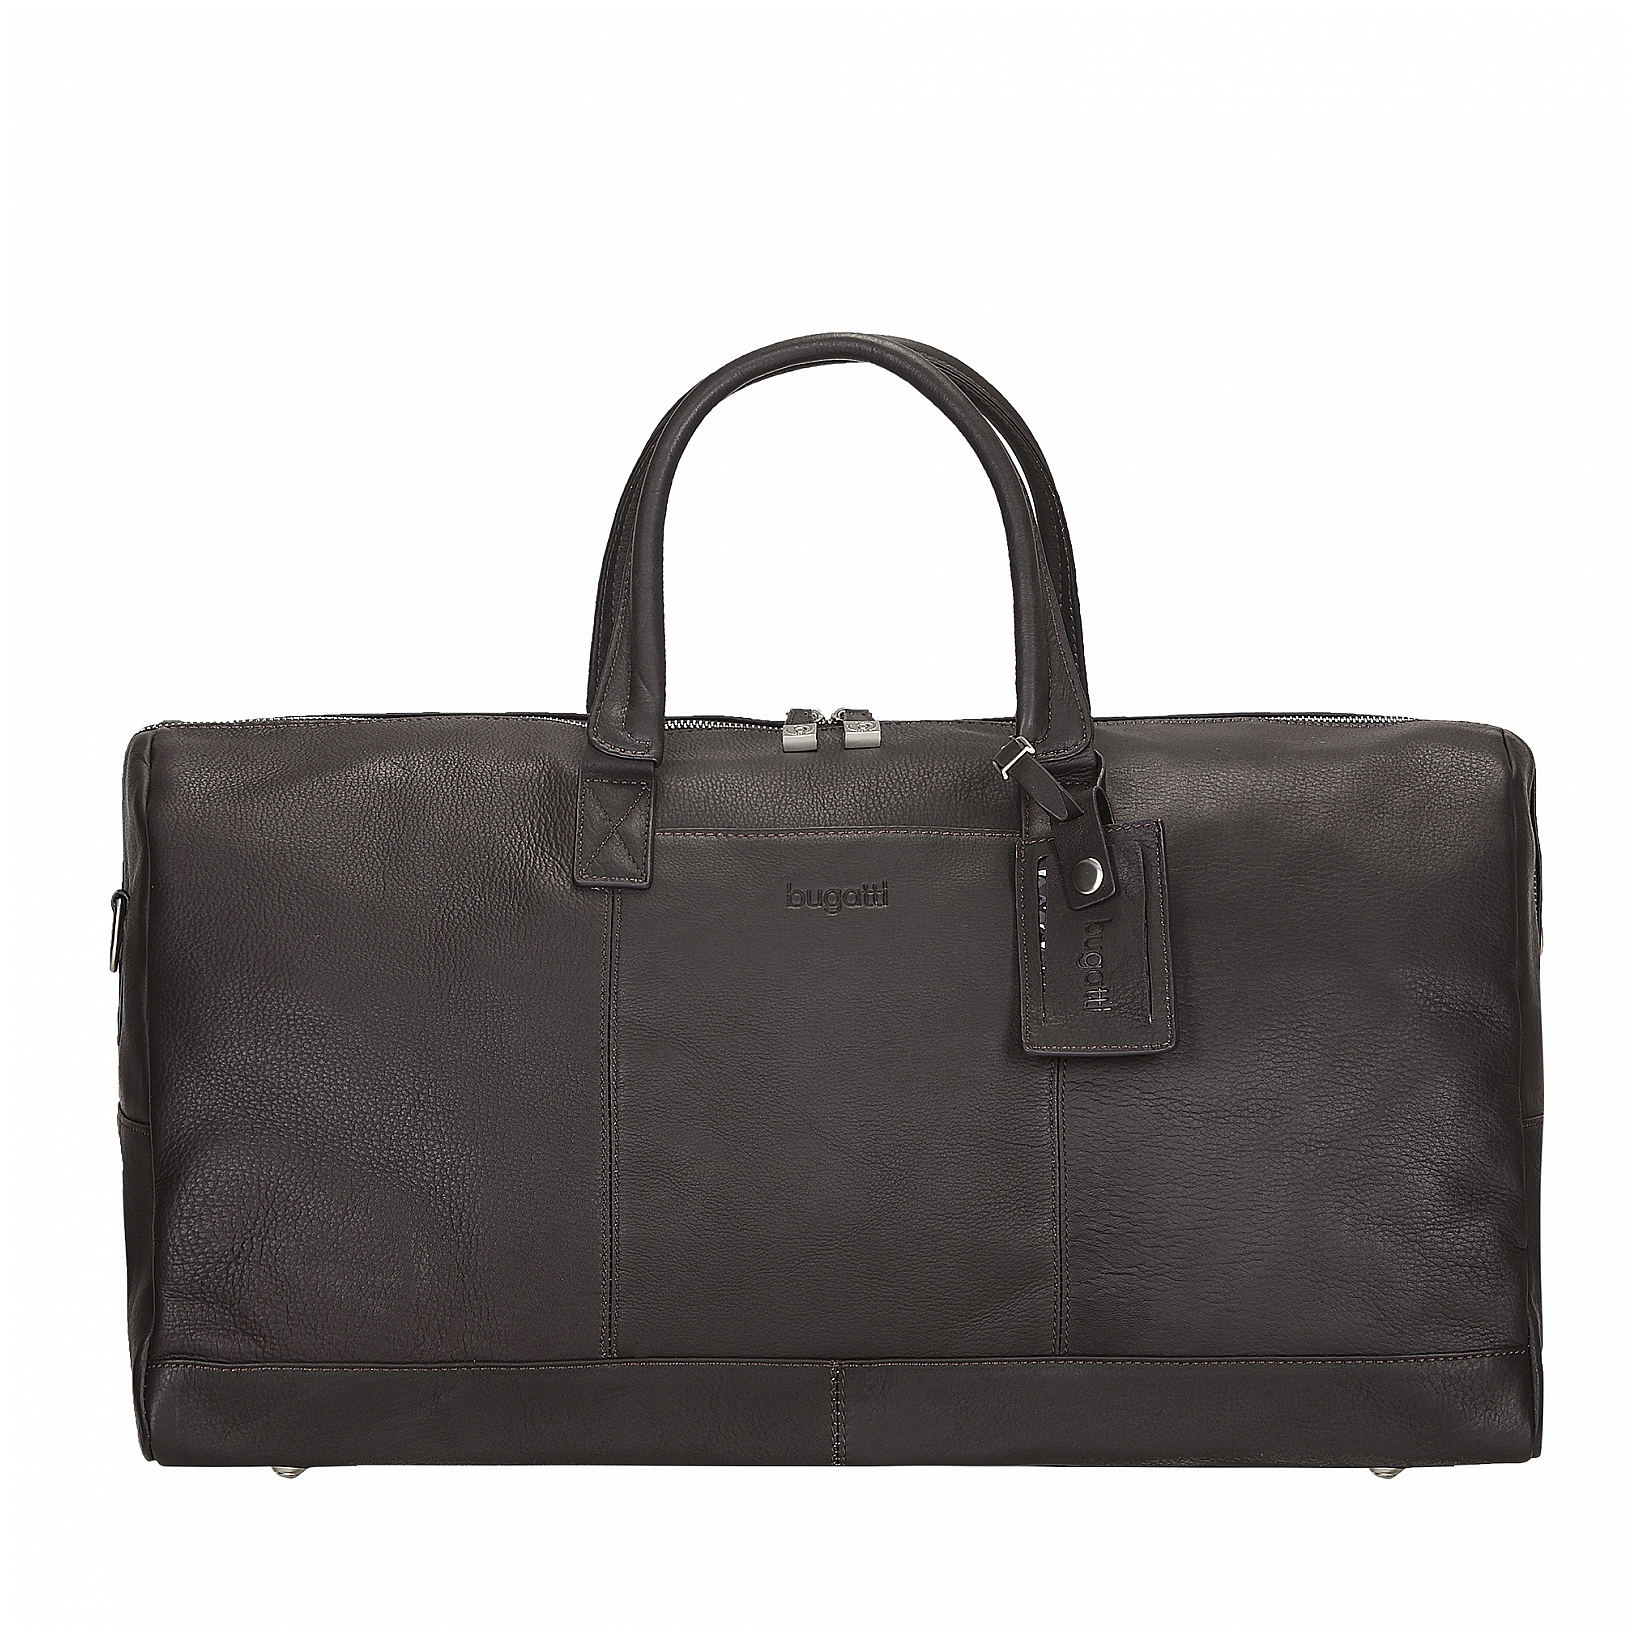 Bugatti Kožená cestovní taška SARTORIA 49546502 hnědá